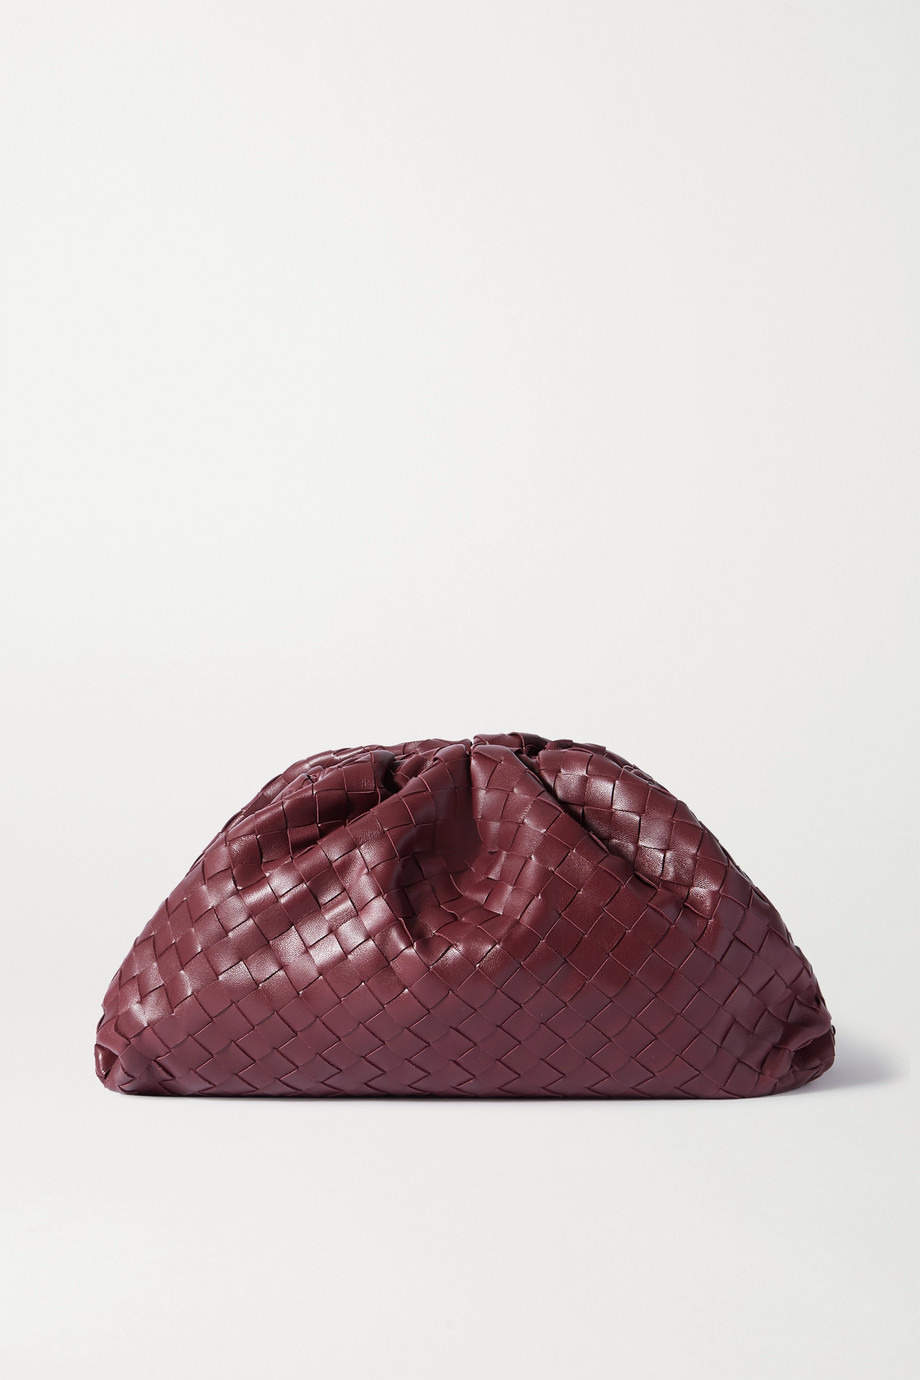 Bottega Veneta The Pouch 缩褶 Intrecciato 编织皮革大号手拿包